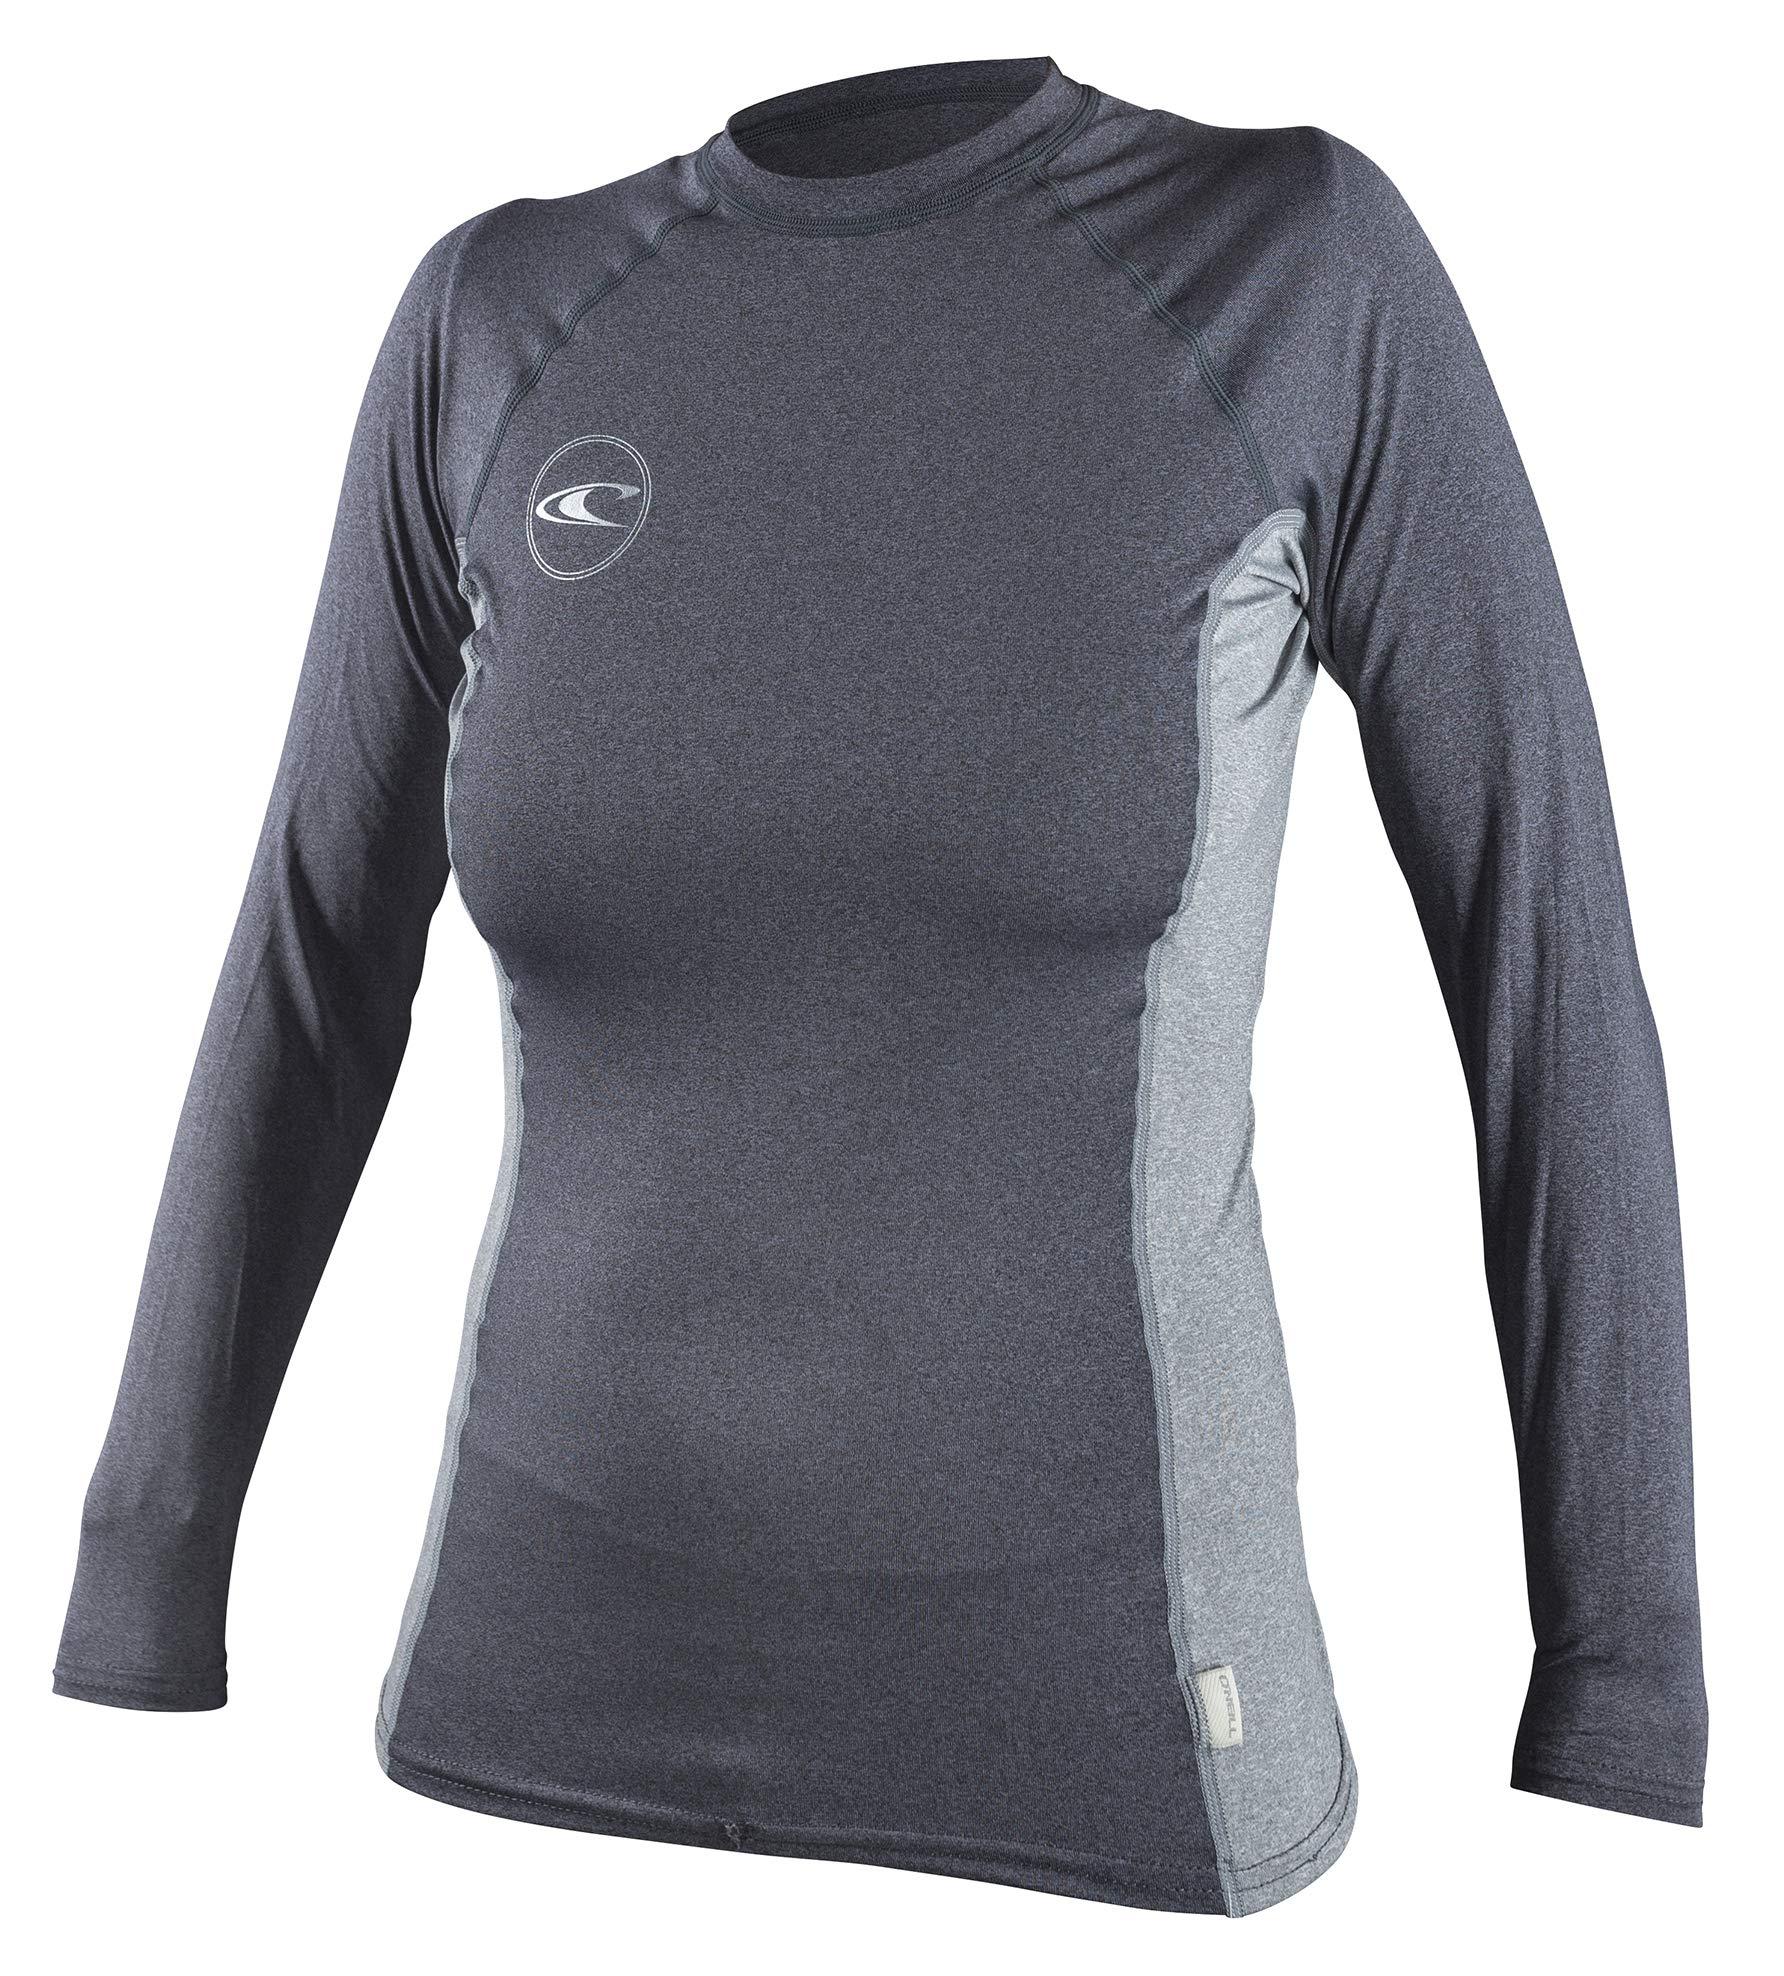 O'Neill Premium Women's Long Sleeve Crew Rashguard, XS, Slate Cool Grey Slate, X-Small